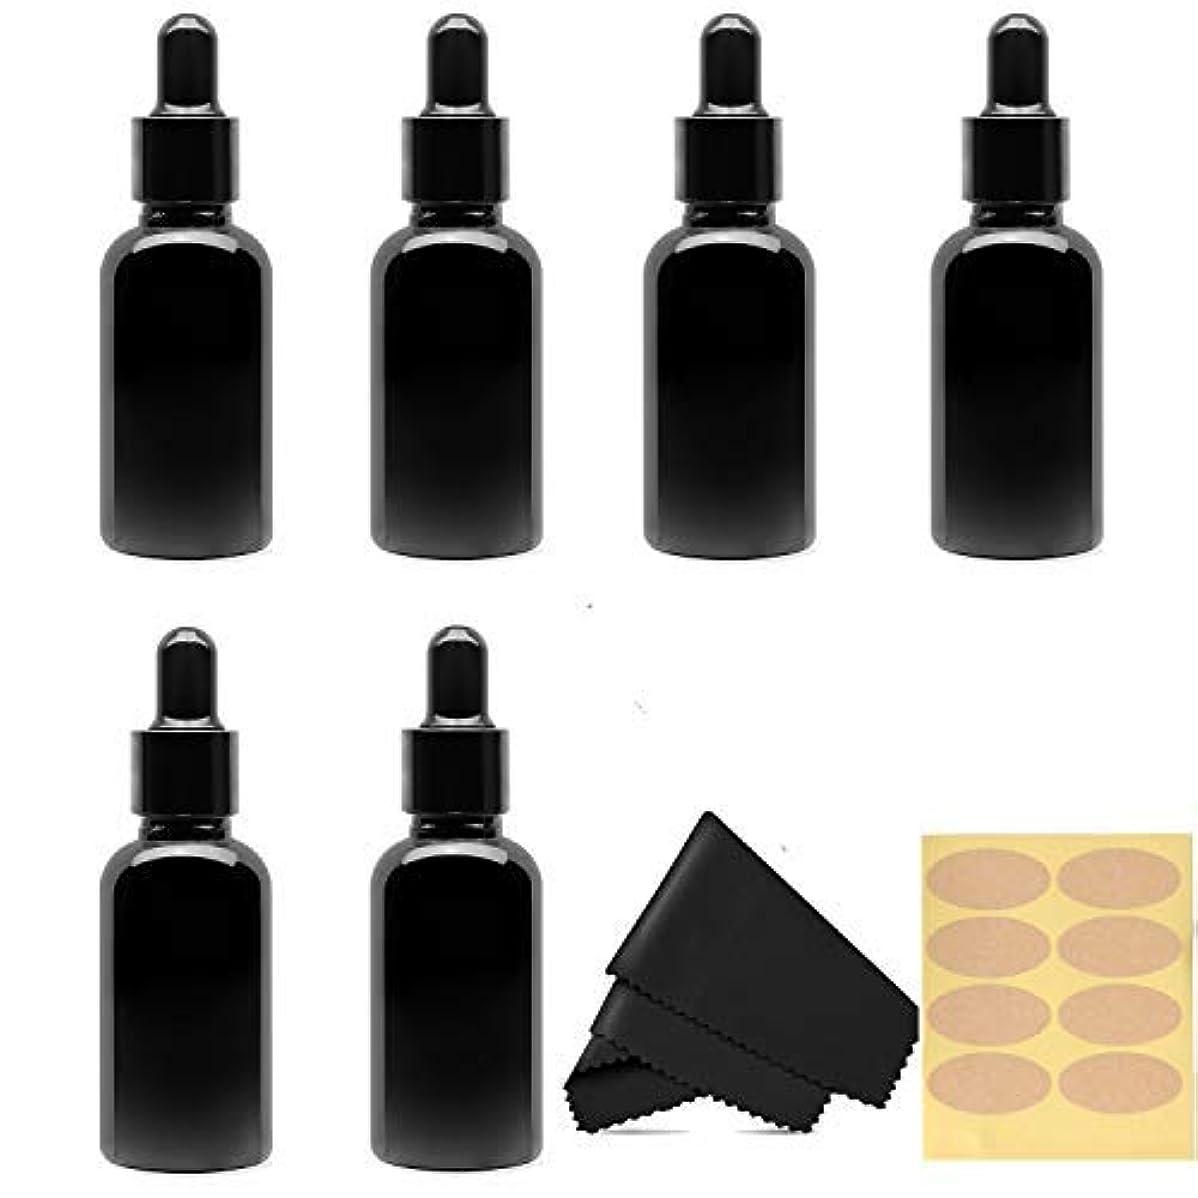 一次墓地批評30 Ml (1 fl oz) Black Glass Essential Oil Bottles with Eye Droppers, 6 Pack [並行輸入品]